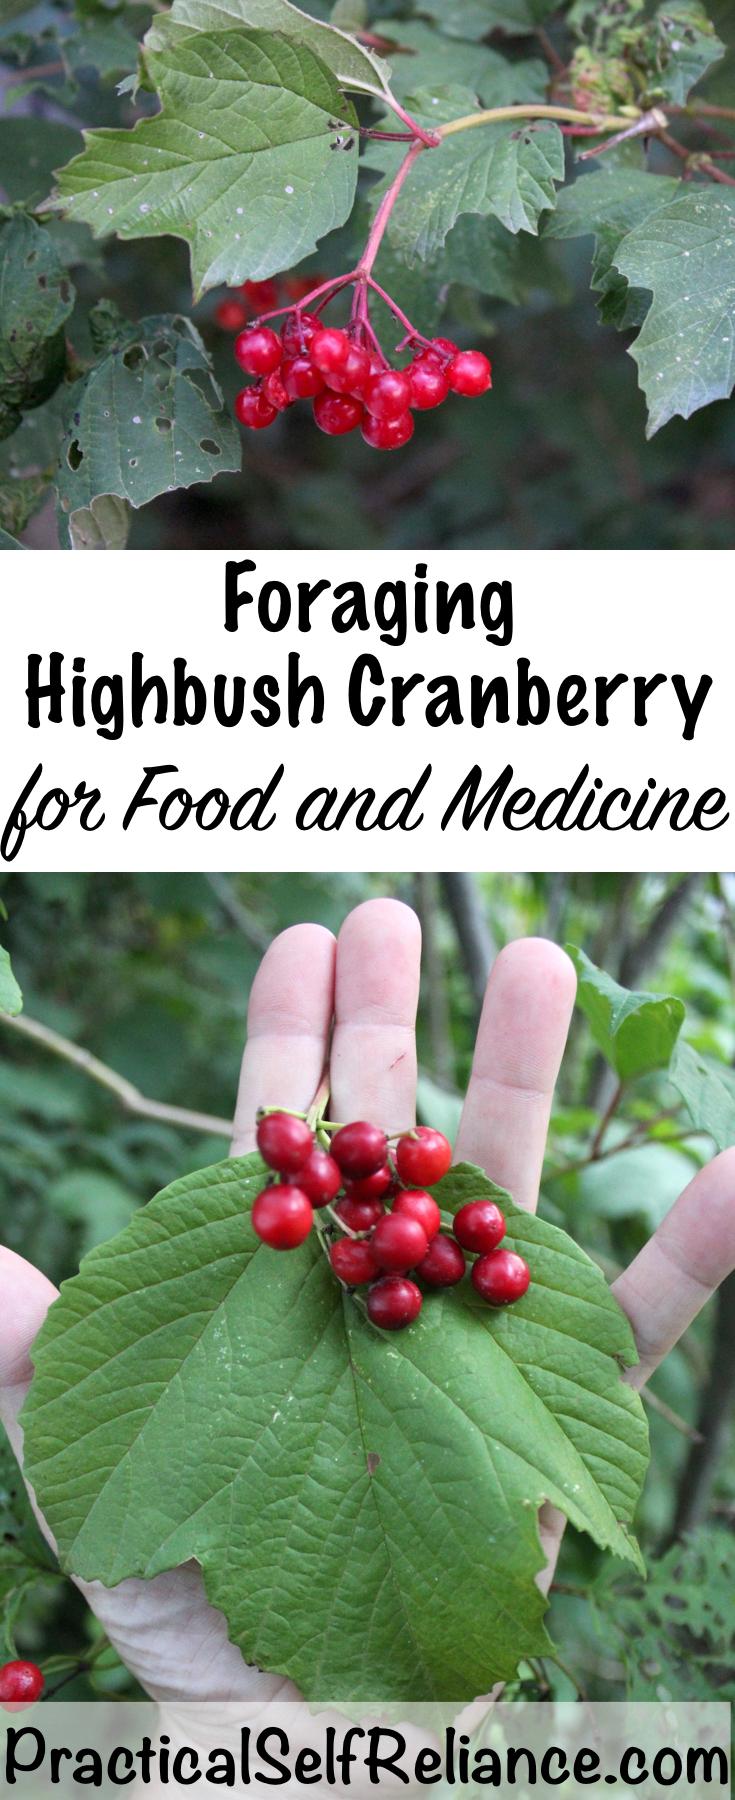 Foraging Highbush Cranberry for Food and Medicine